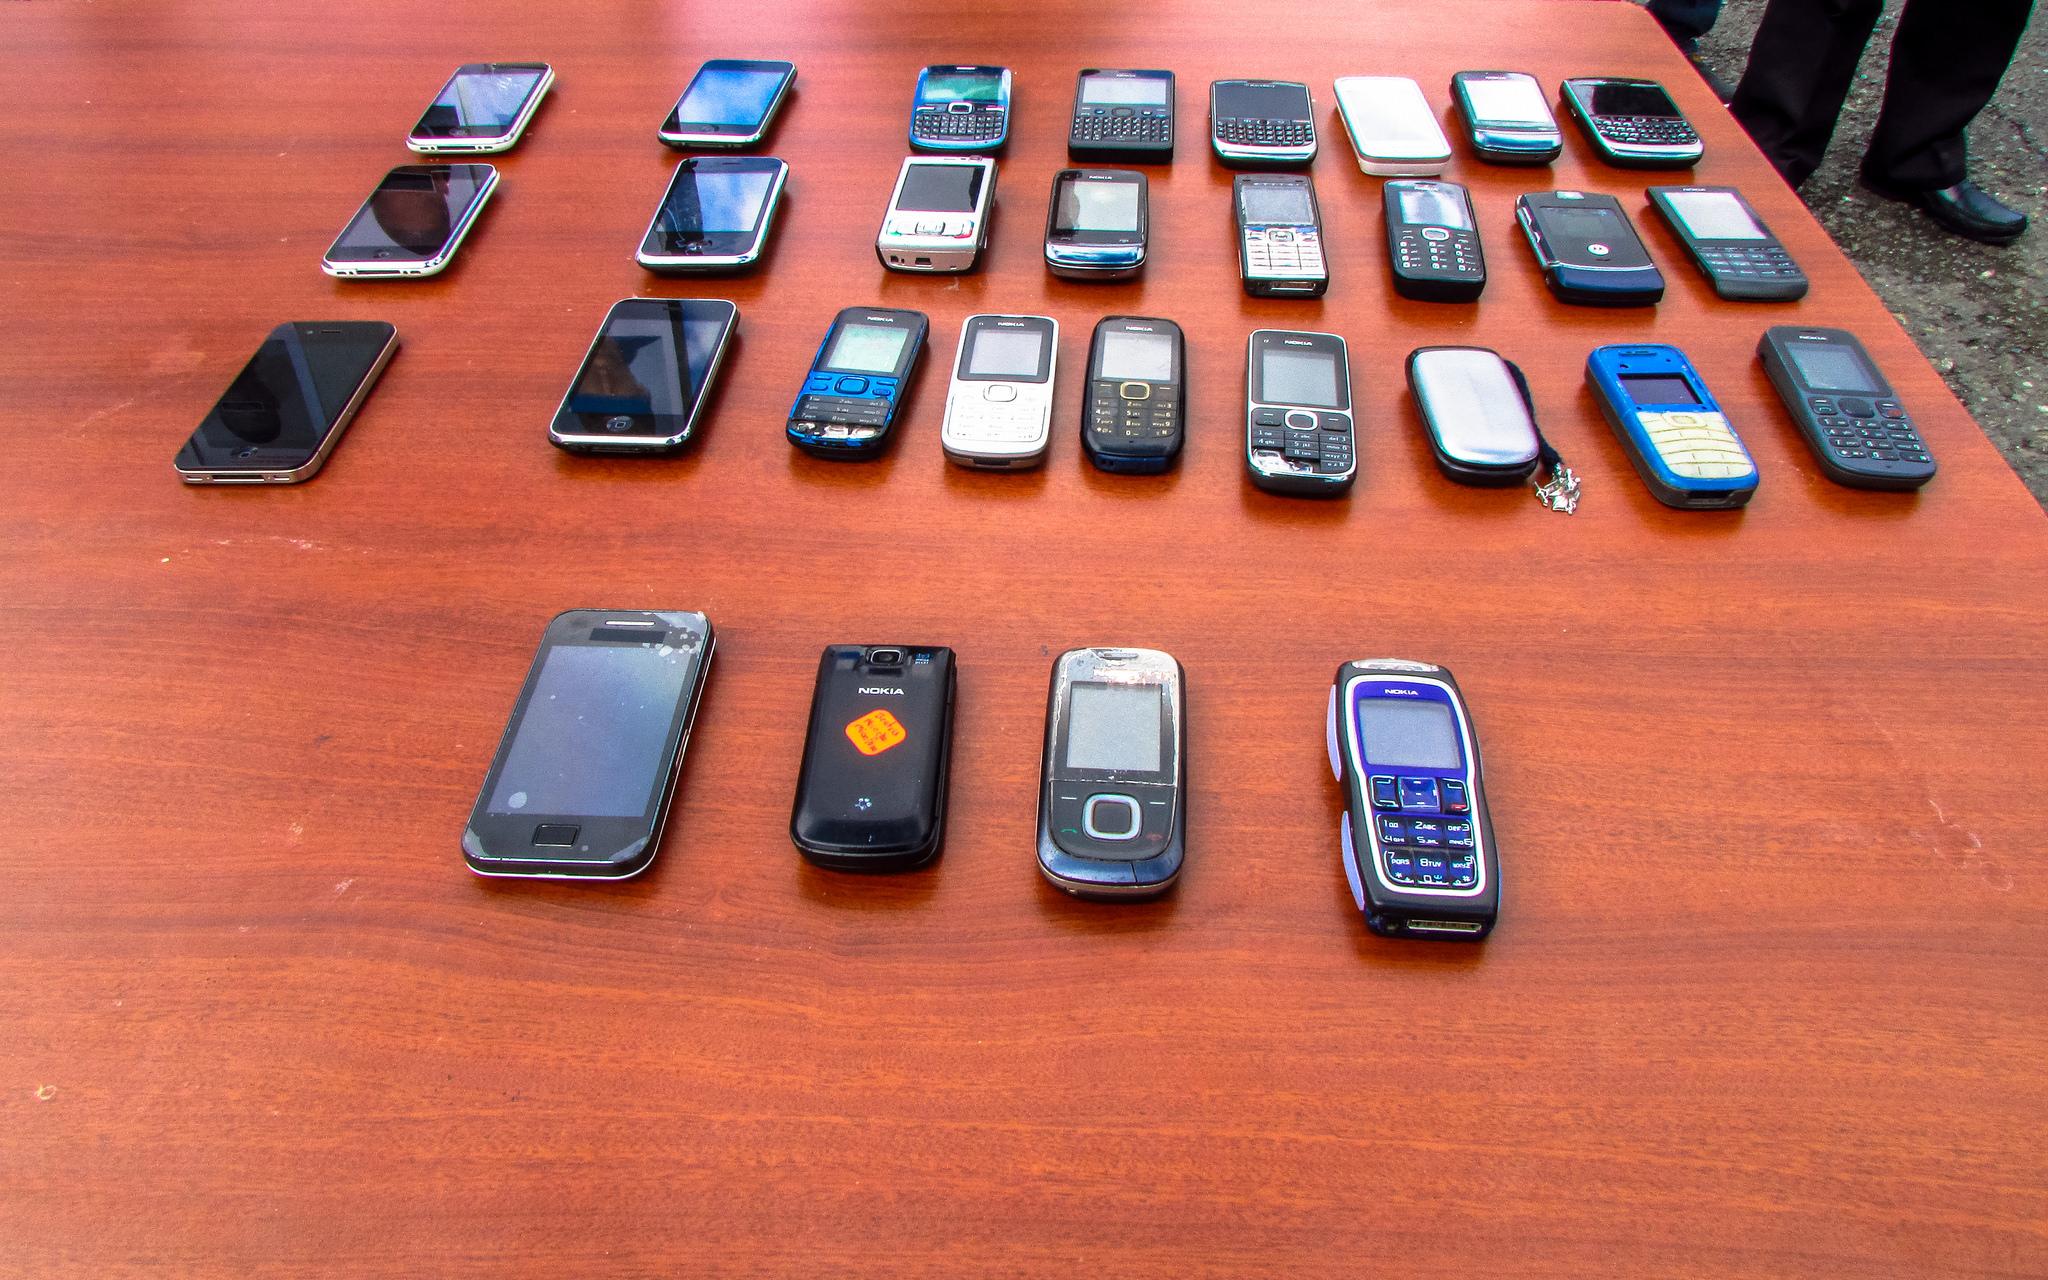 M s de celulares fueron robados desde 2013 vistazo for Ministerio de seguridad telefonos internos